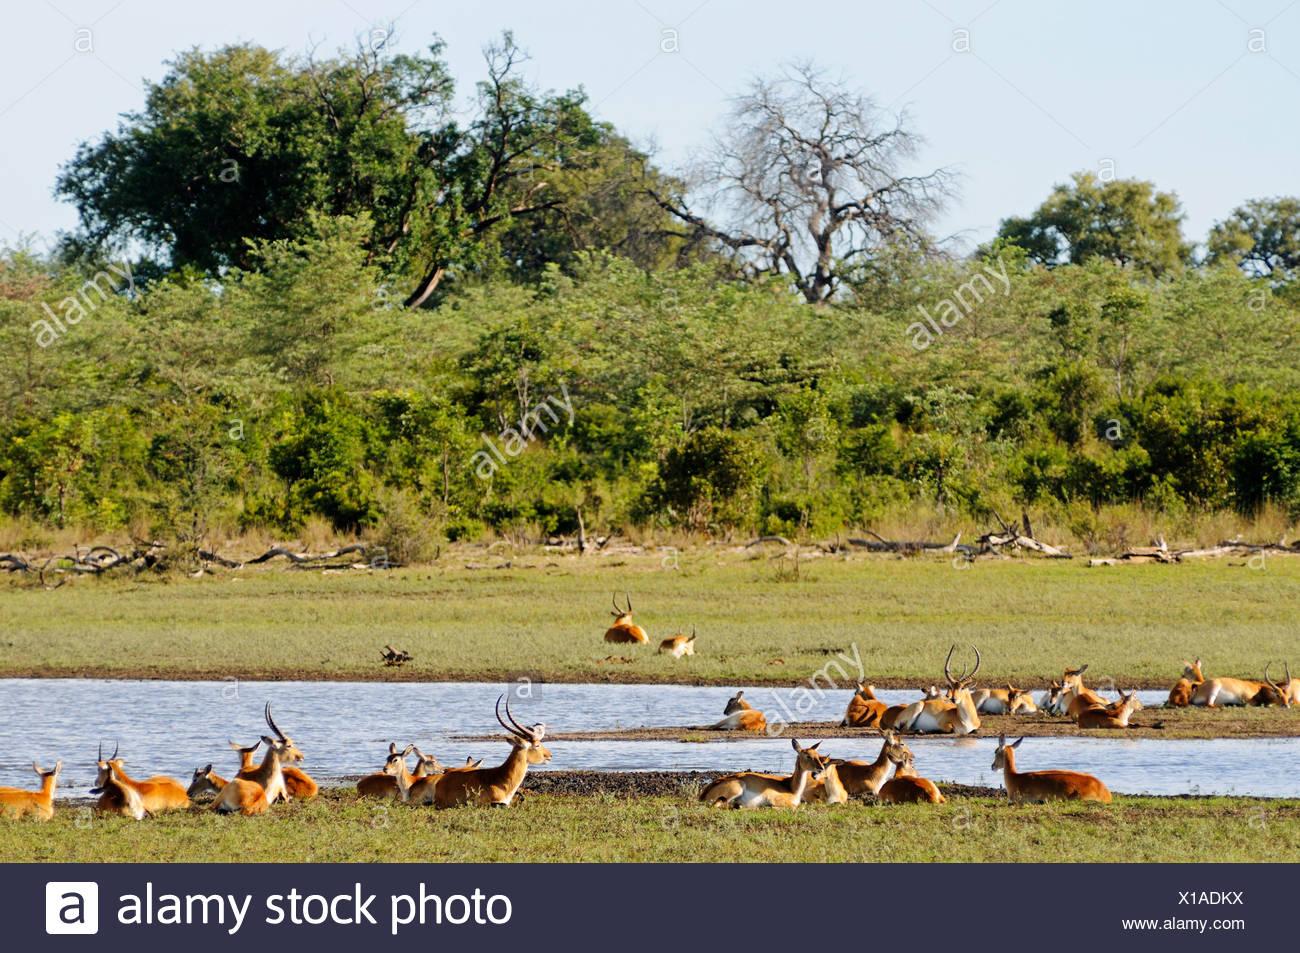 Southern Lechwe (Kobus leche) antelopes, in Bwabwata National Park, former Caprivi National Park and Mahango National Park - Stock Image